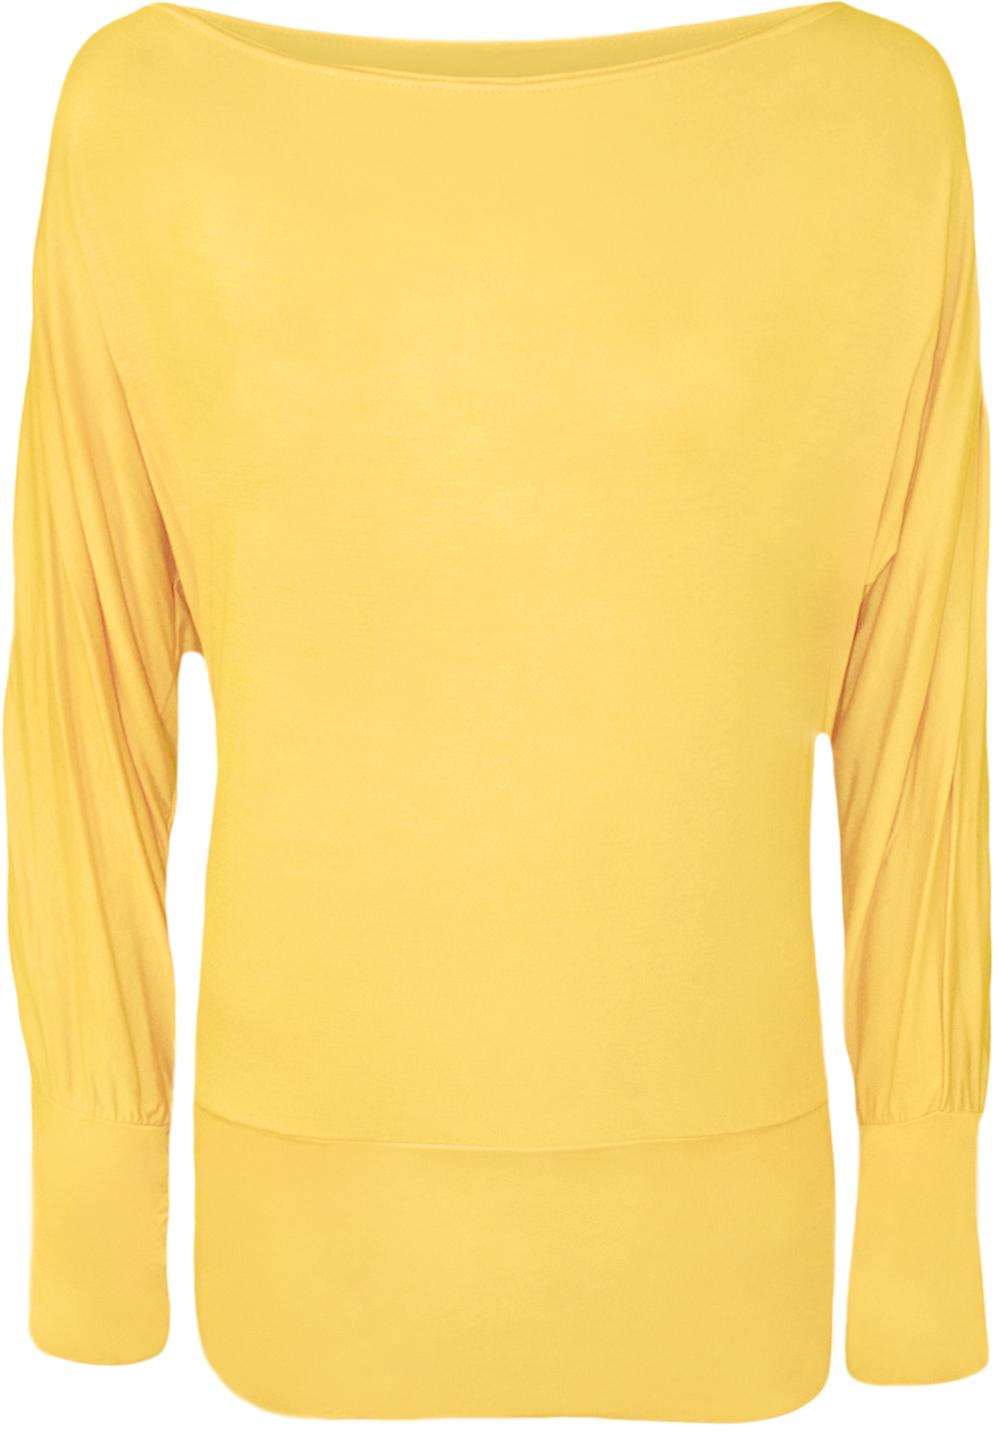 New ladies plain long sleeved batwing t shirt womens for Plain yellow long sleeve t shirt